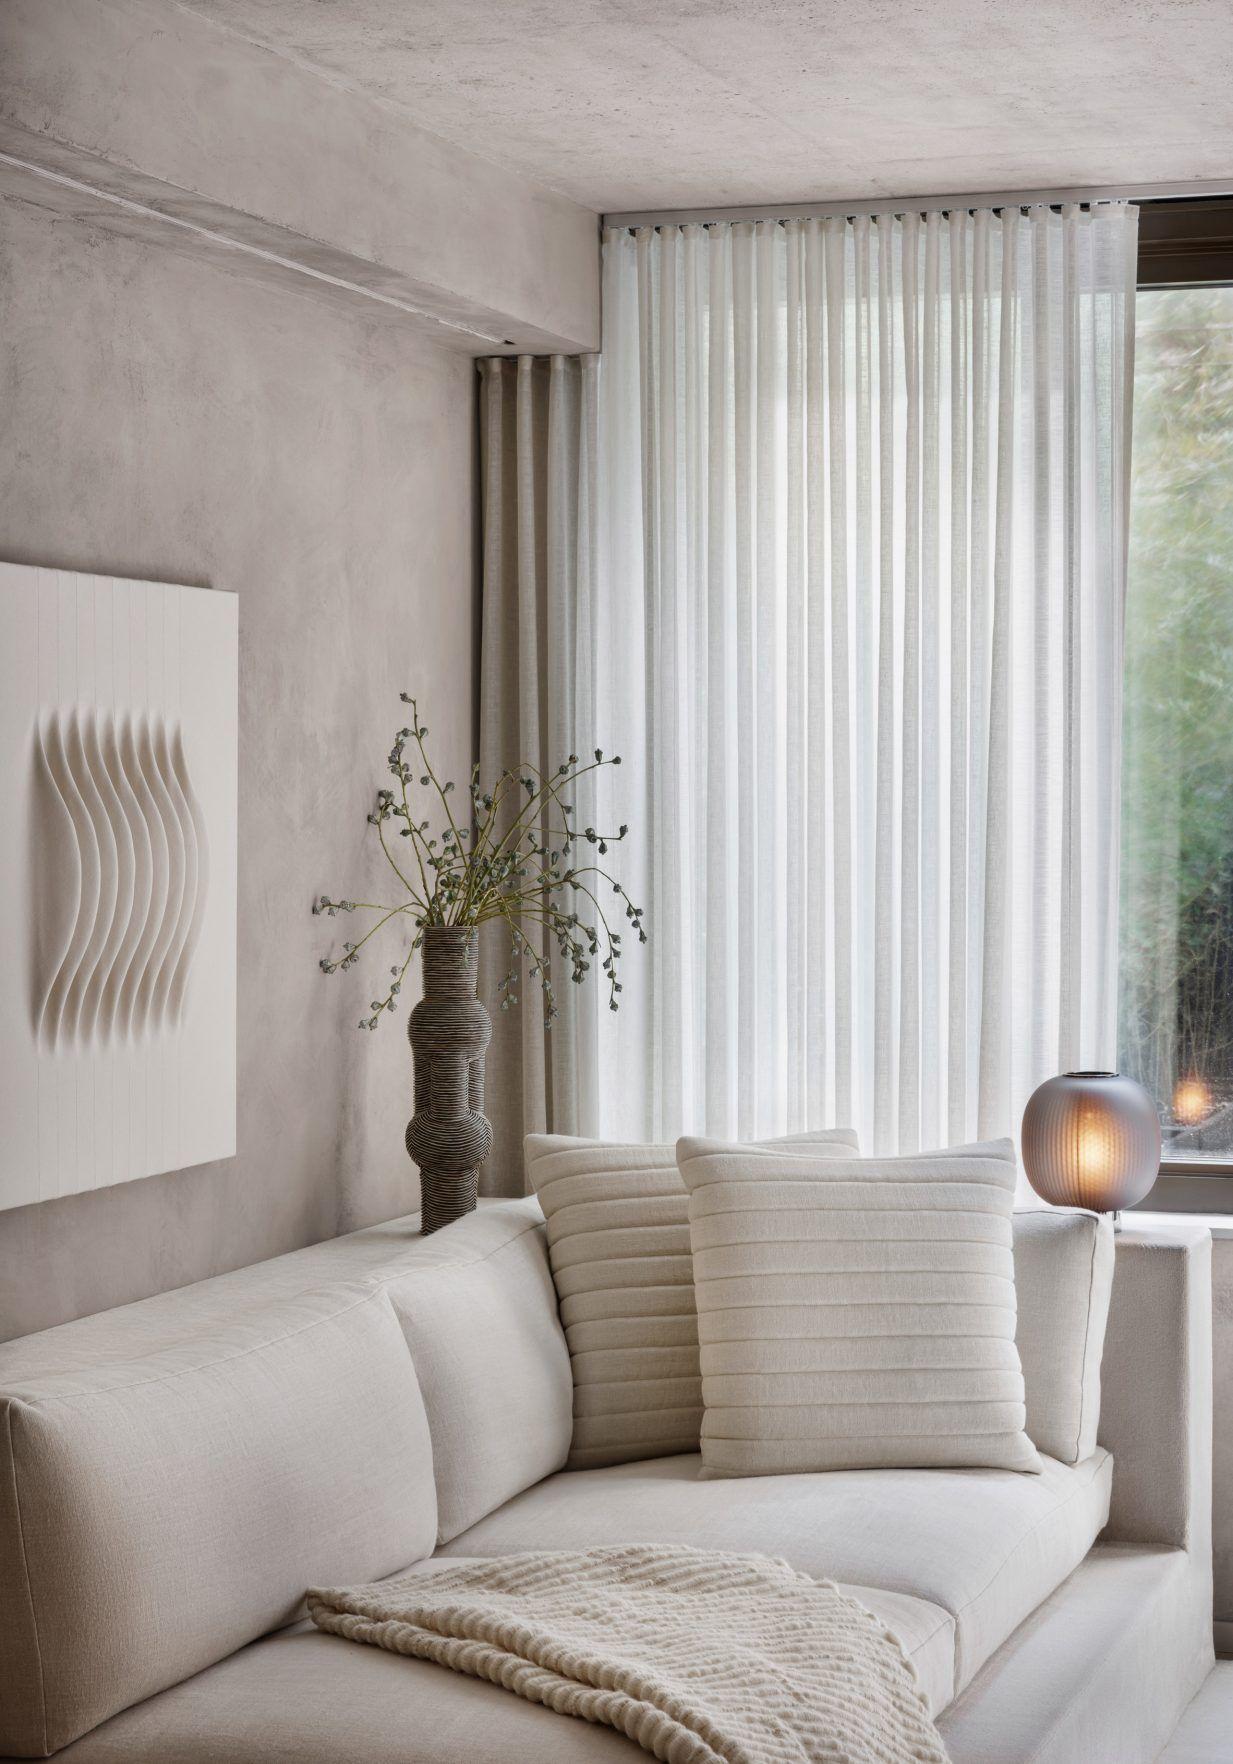 Living Room Interior Design Ideas Uk: Coolest Mid-century Lighting Designs For UK!